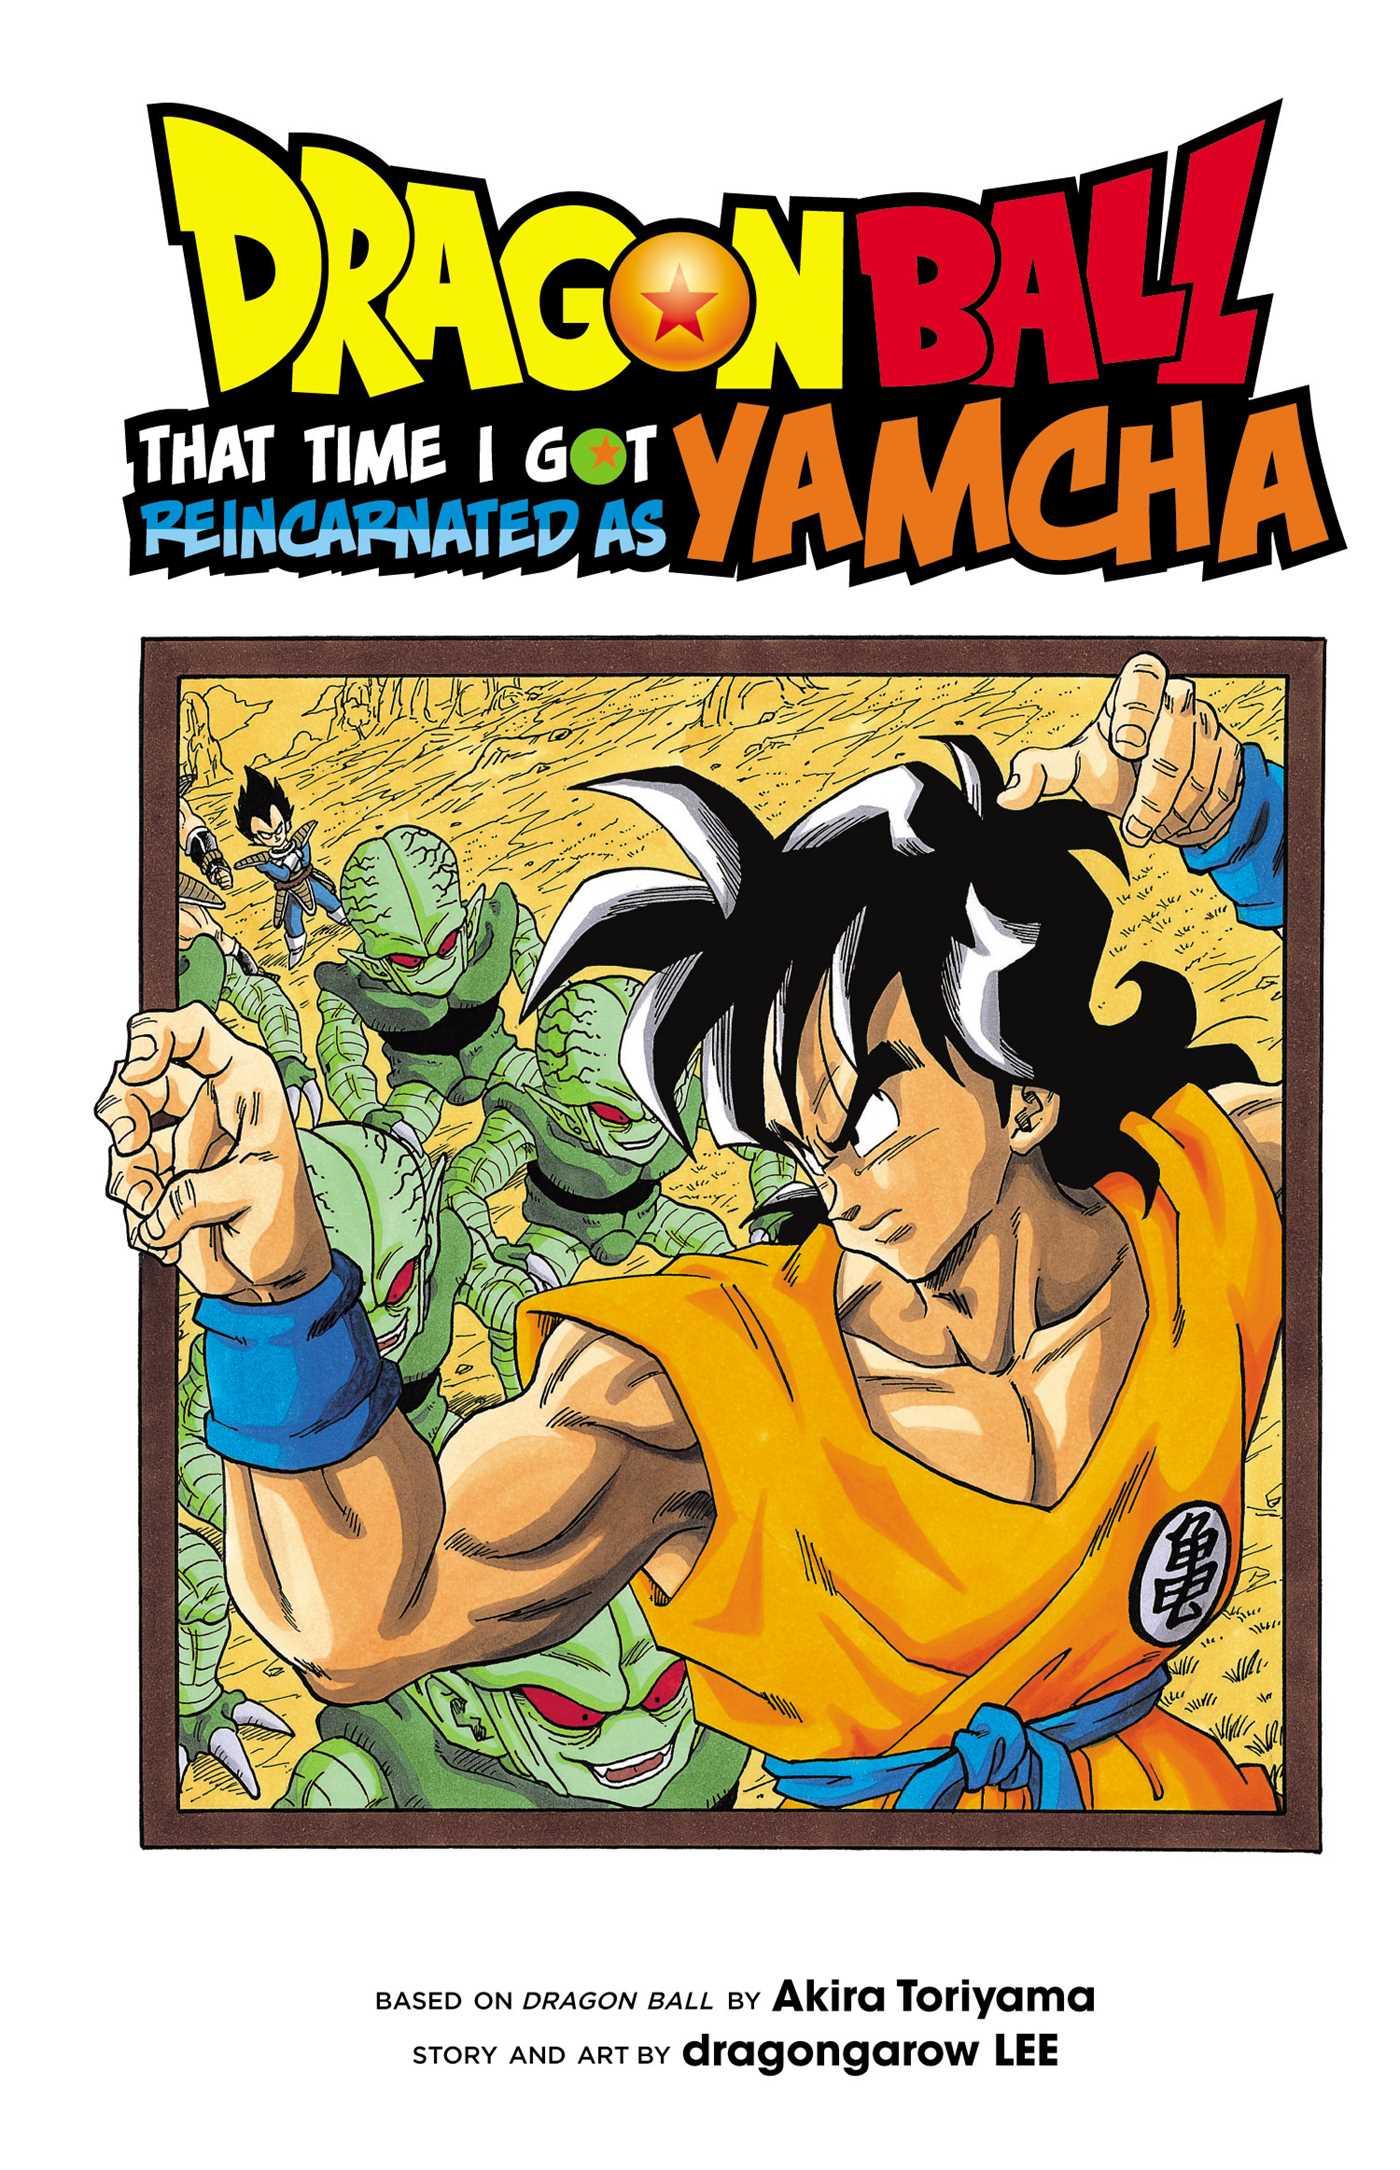 dragon ball that time i got reincarnated as yamcha book by akira